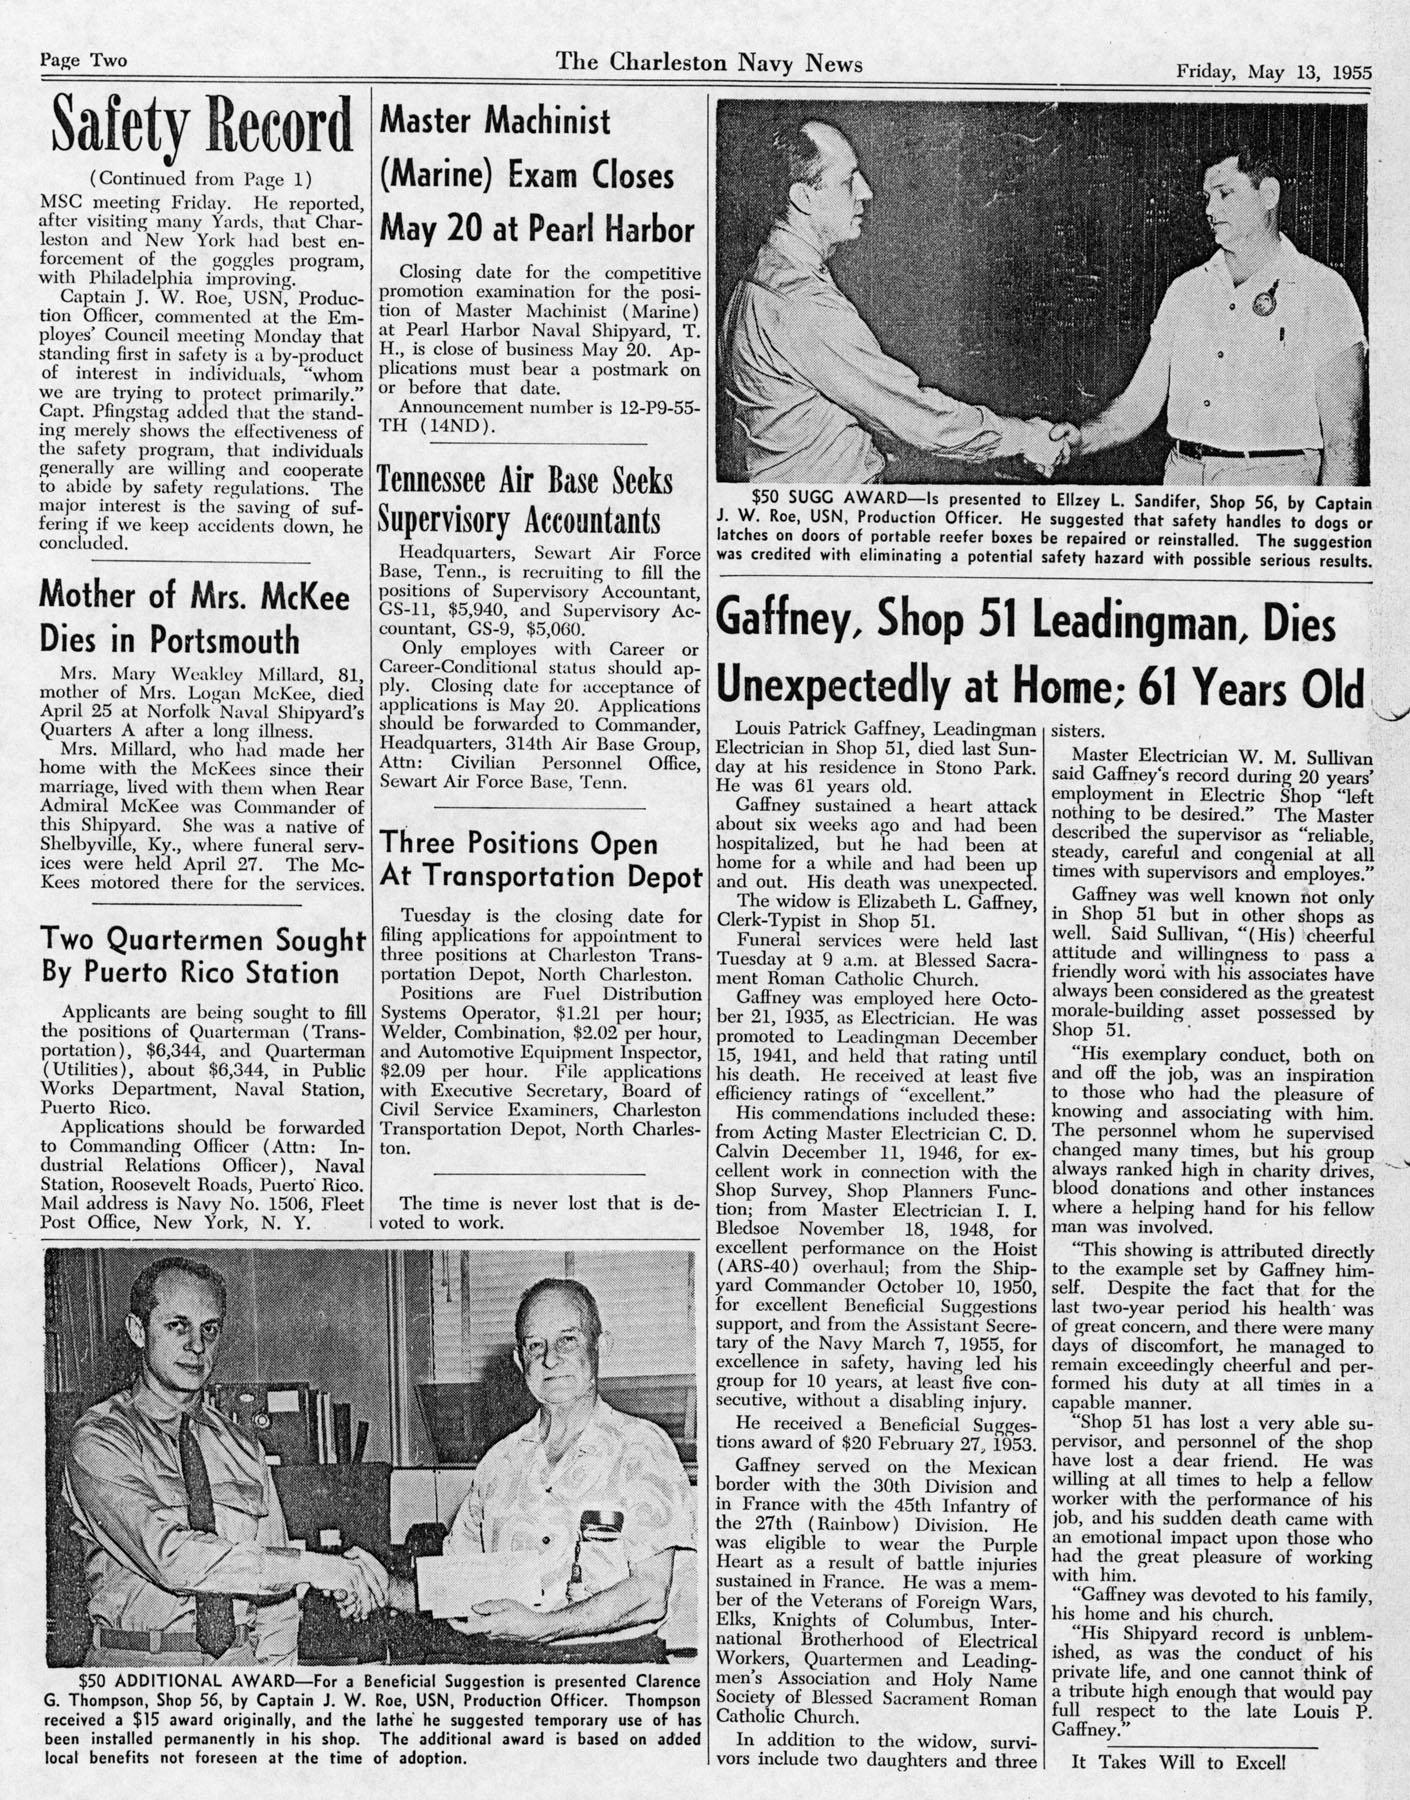 The Charleston Navy News, Volume 13, Edition 22, page ii